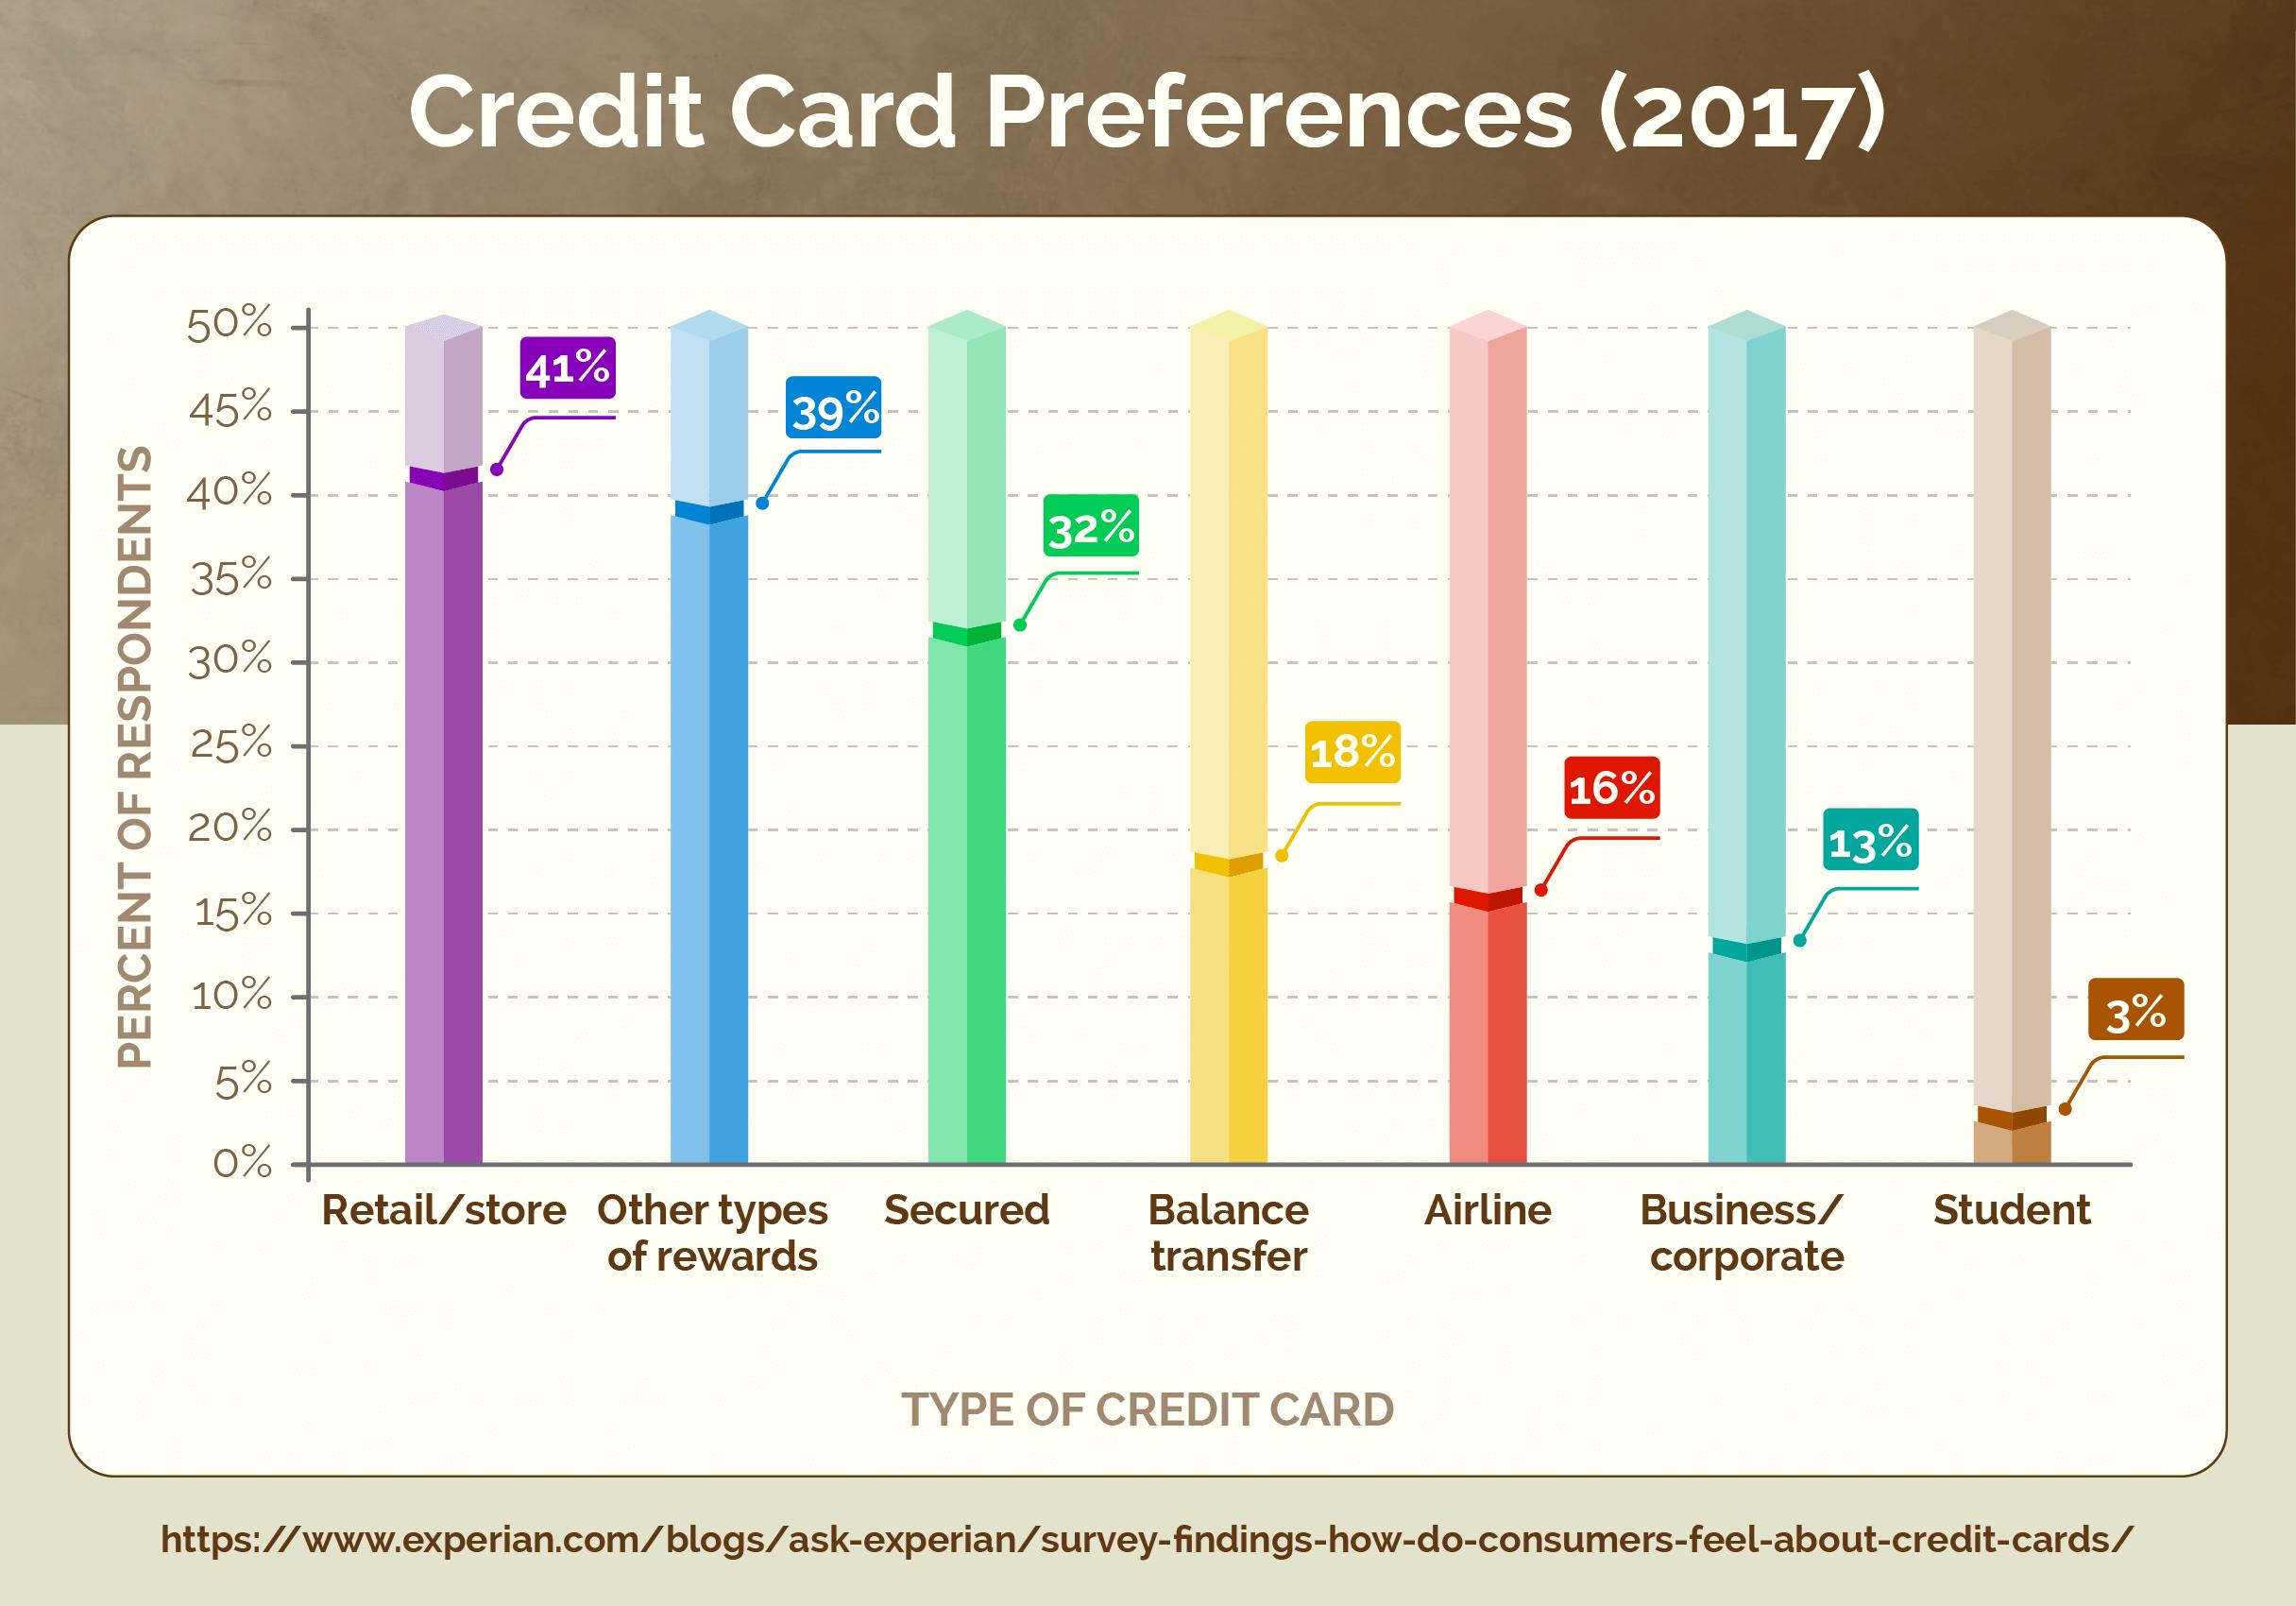 Credit Card Preferences (2017)